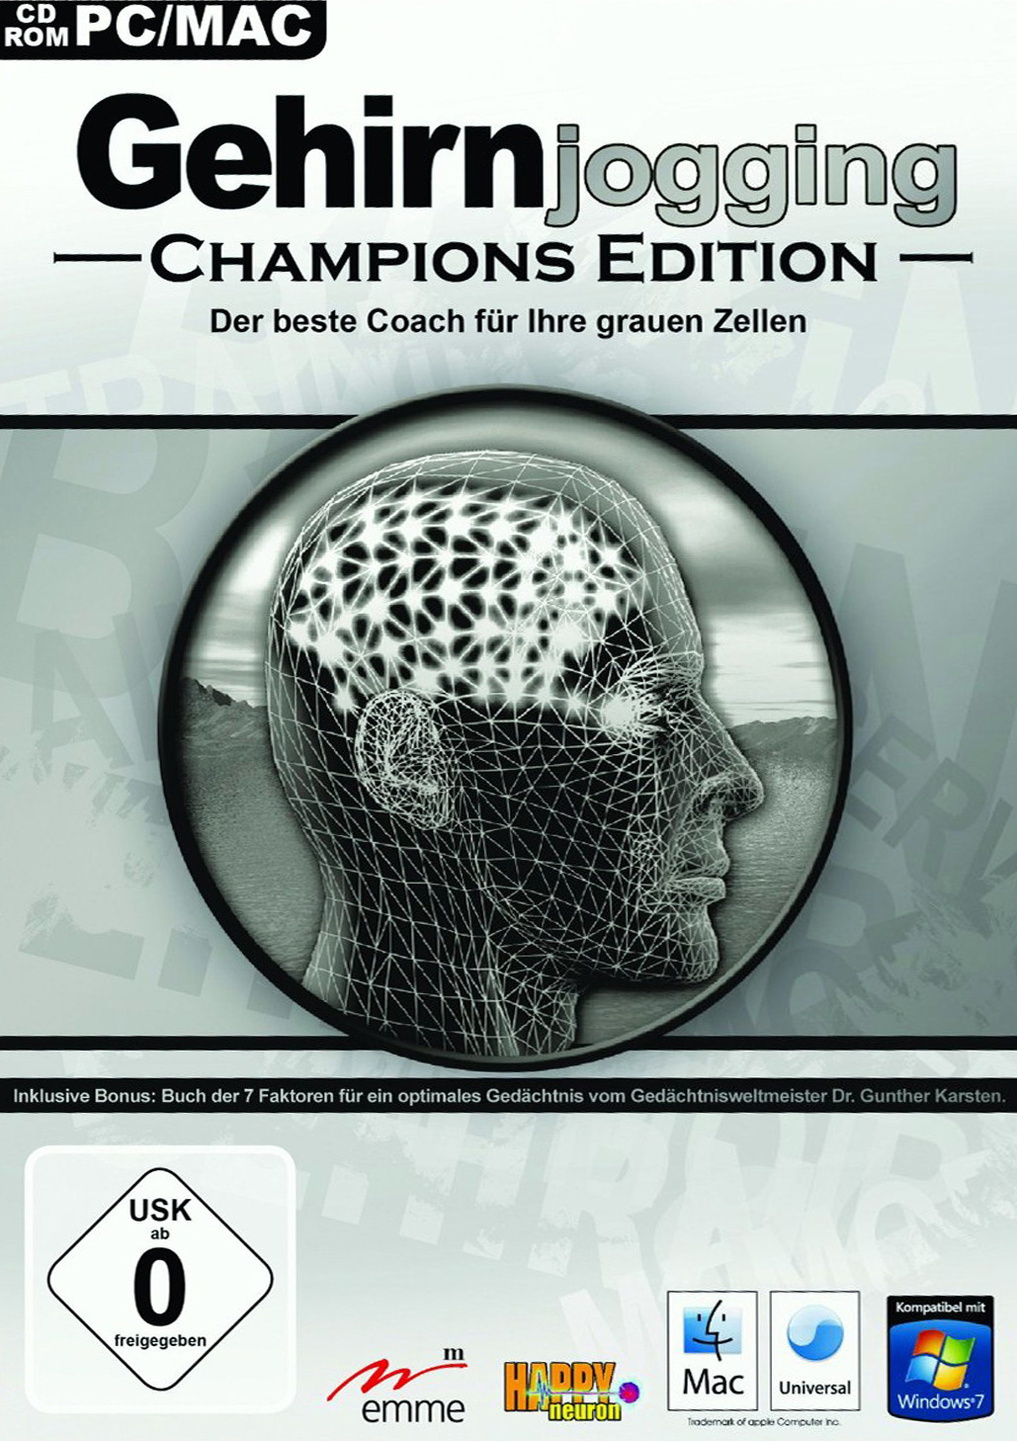 Gehirnjogging [Champions Edition]